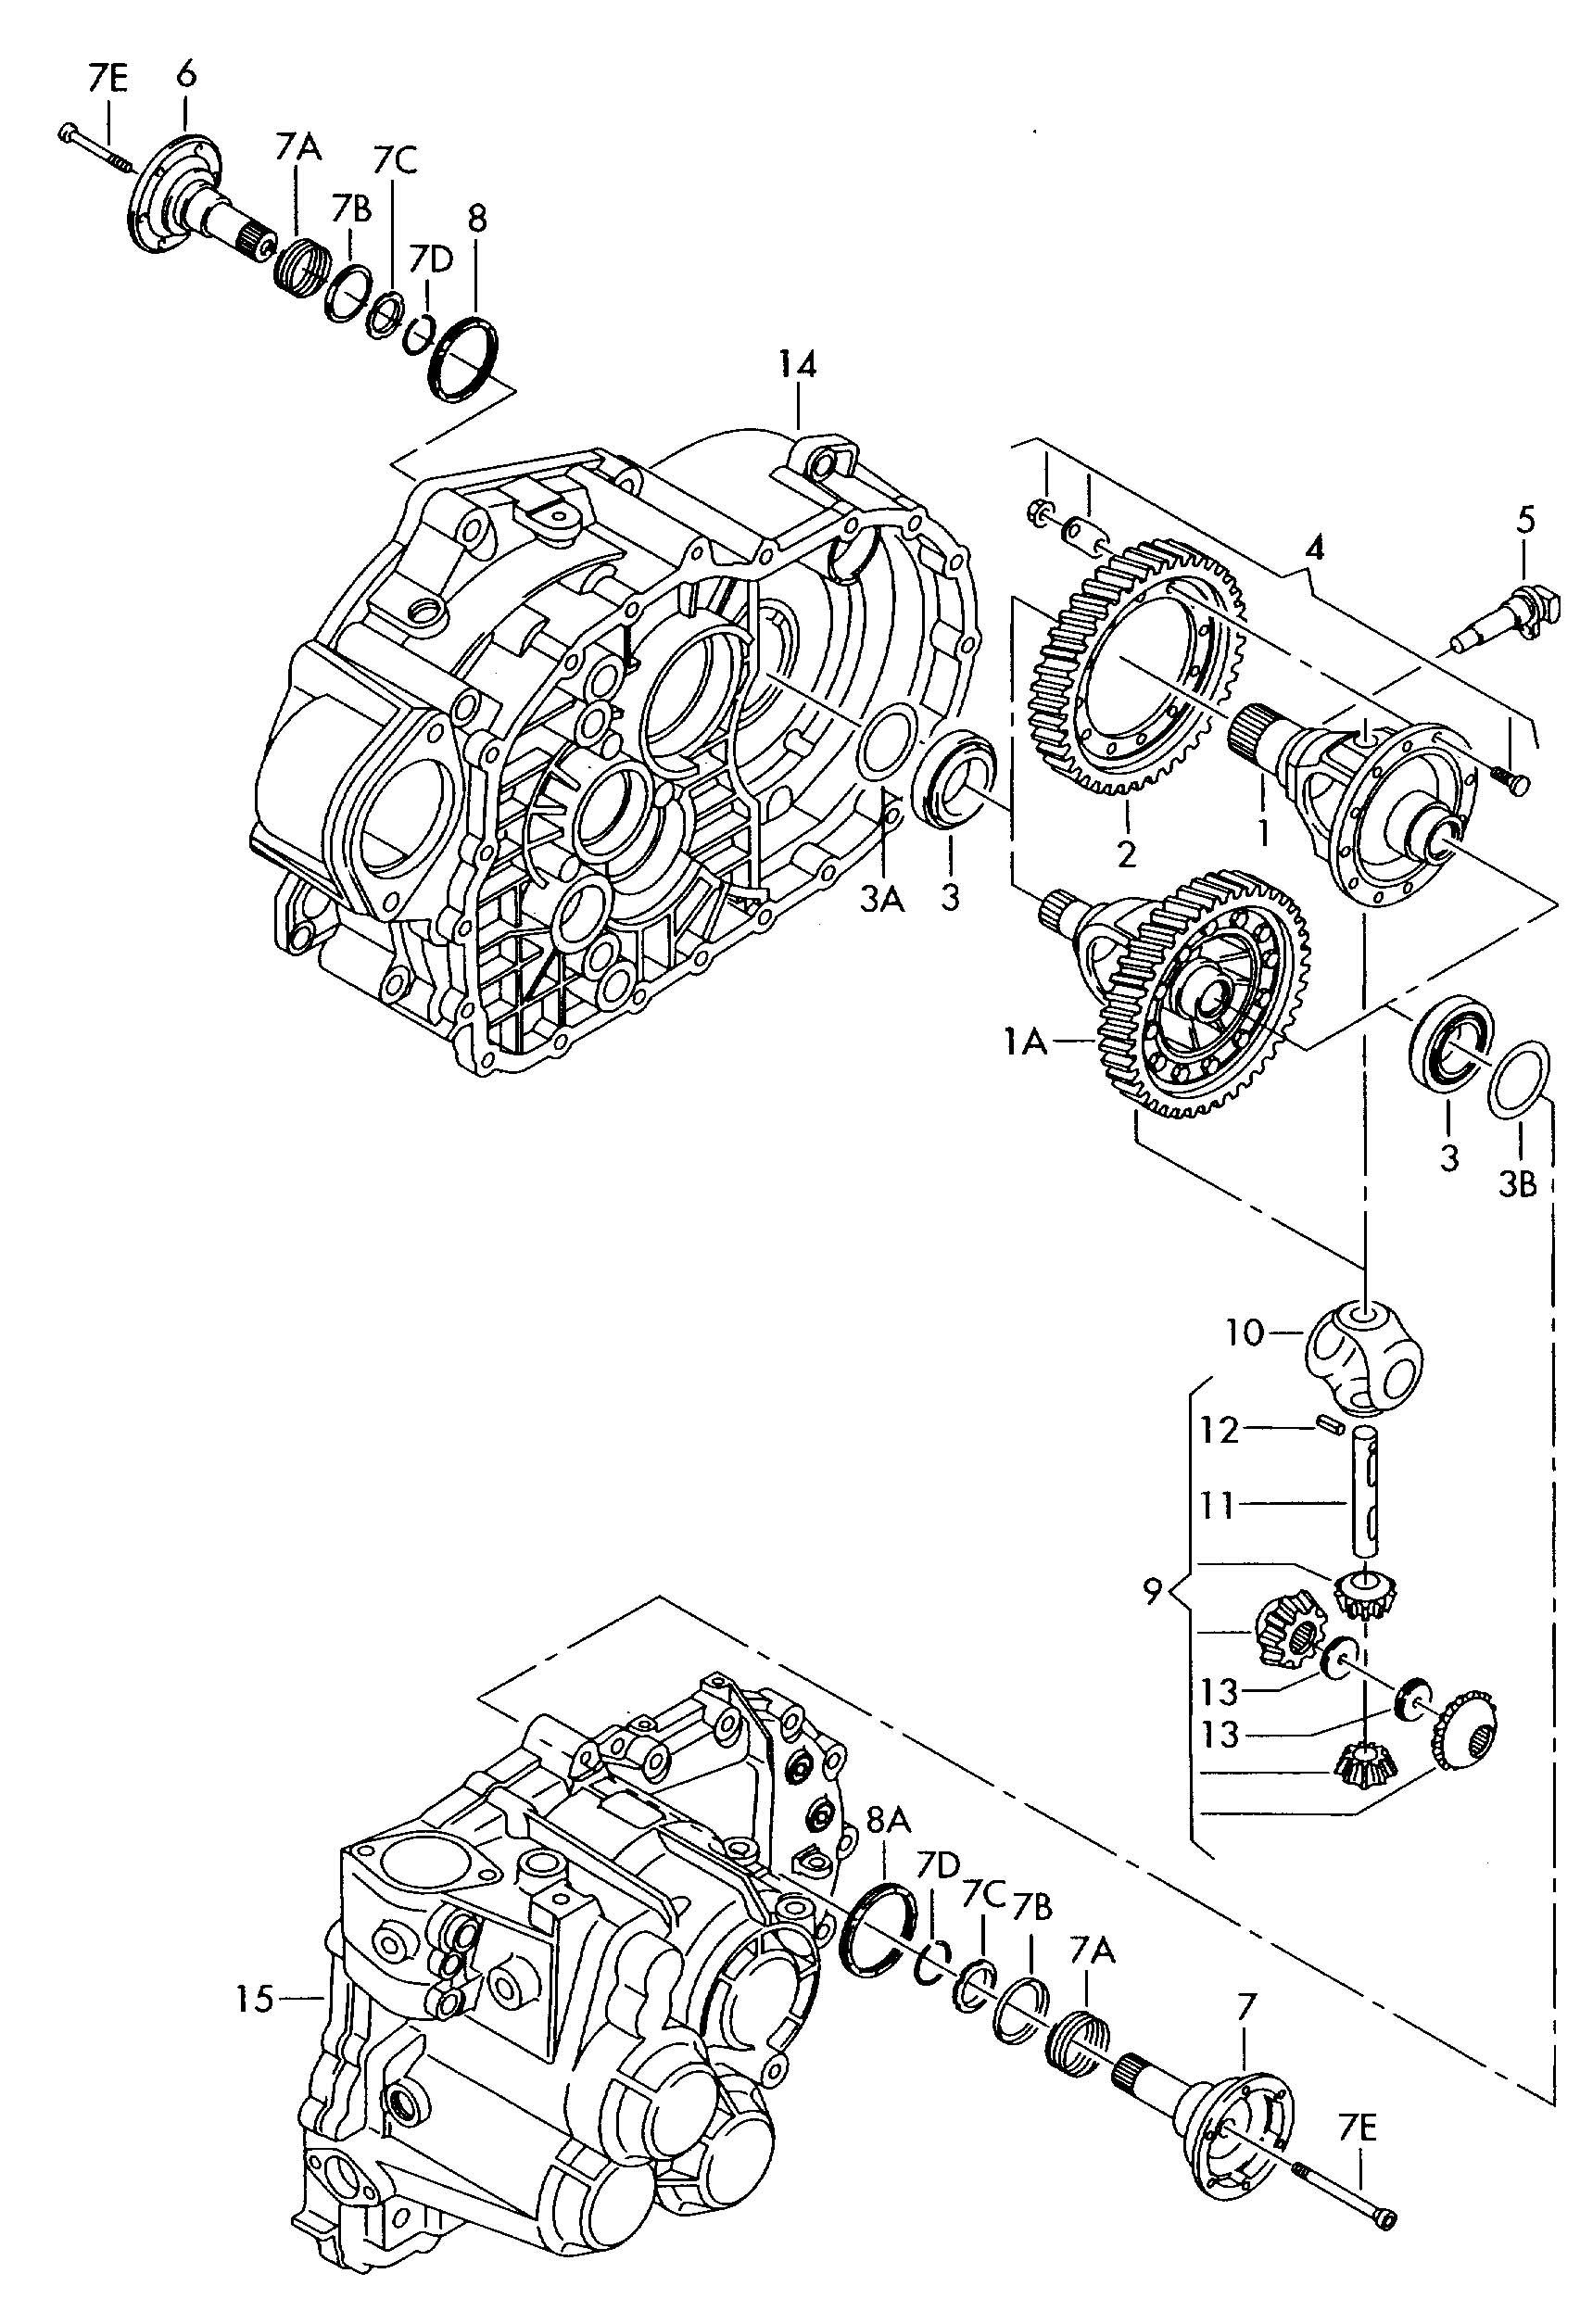 1998 ford f150 transmission diagram 7 pin trailer socket wiring water temp sensor location 2004 get free